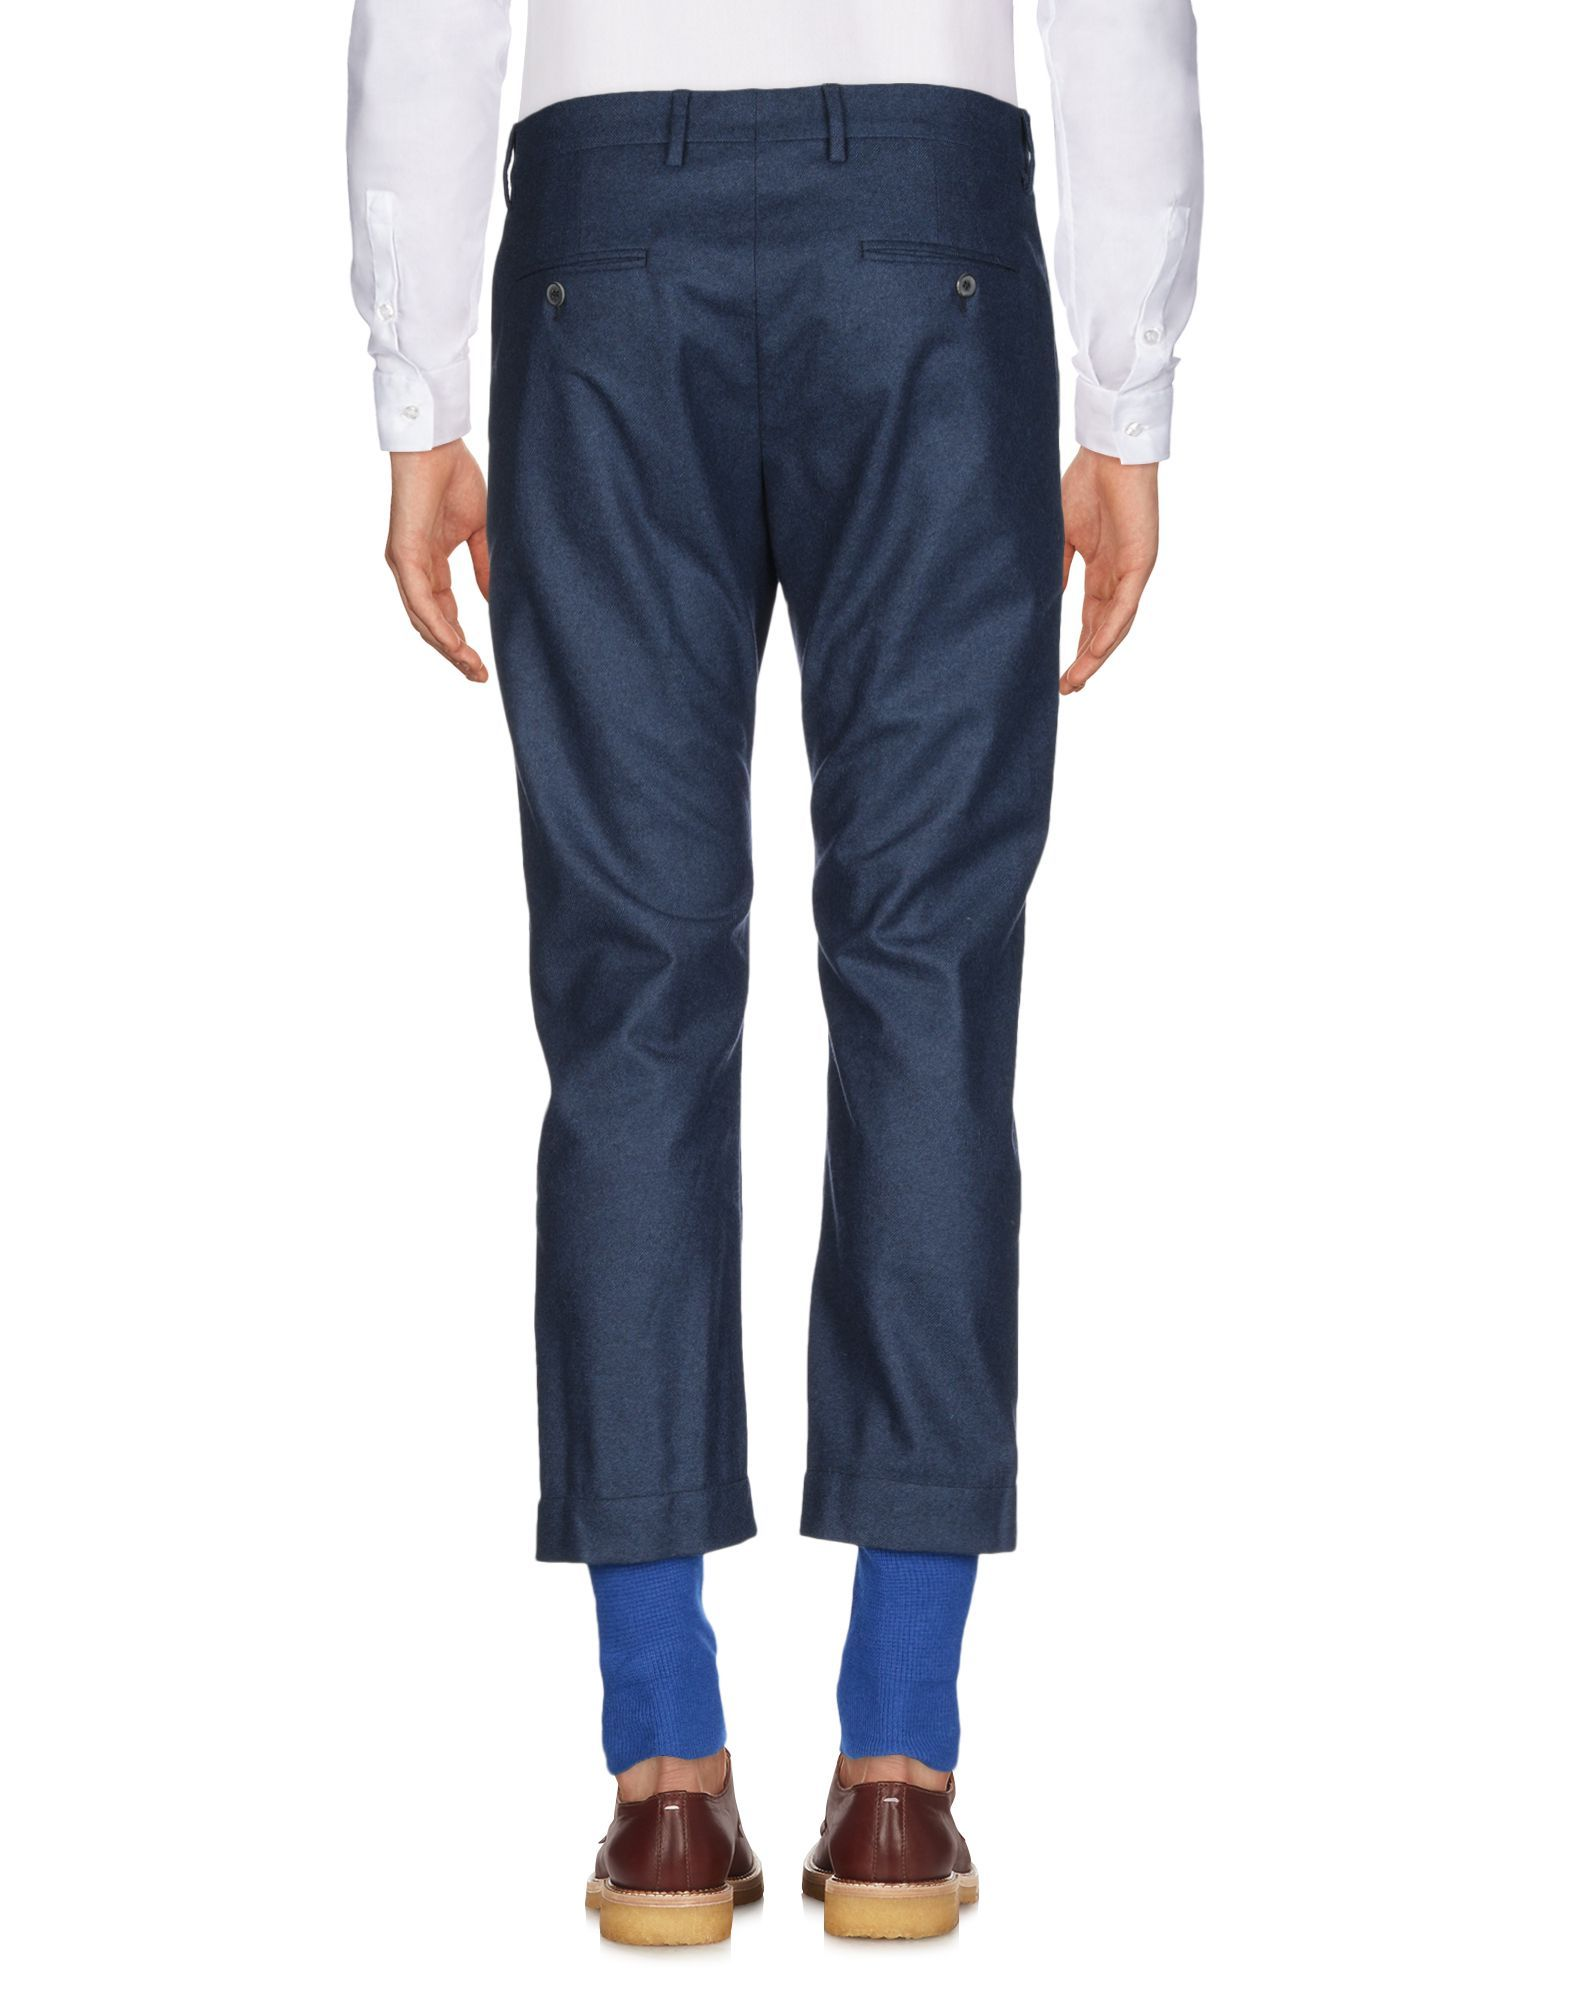 Mauro Grifoni Blue Wool Trousers